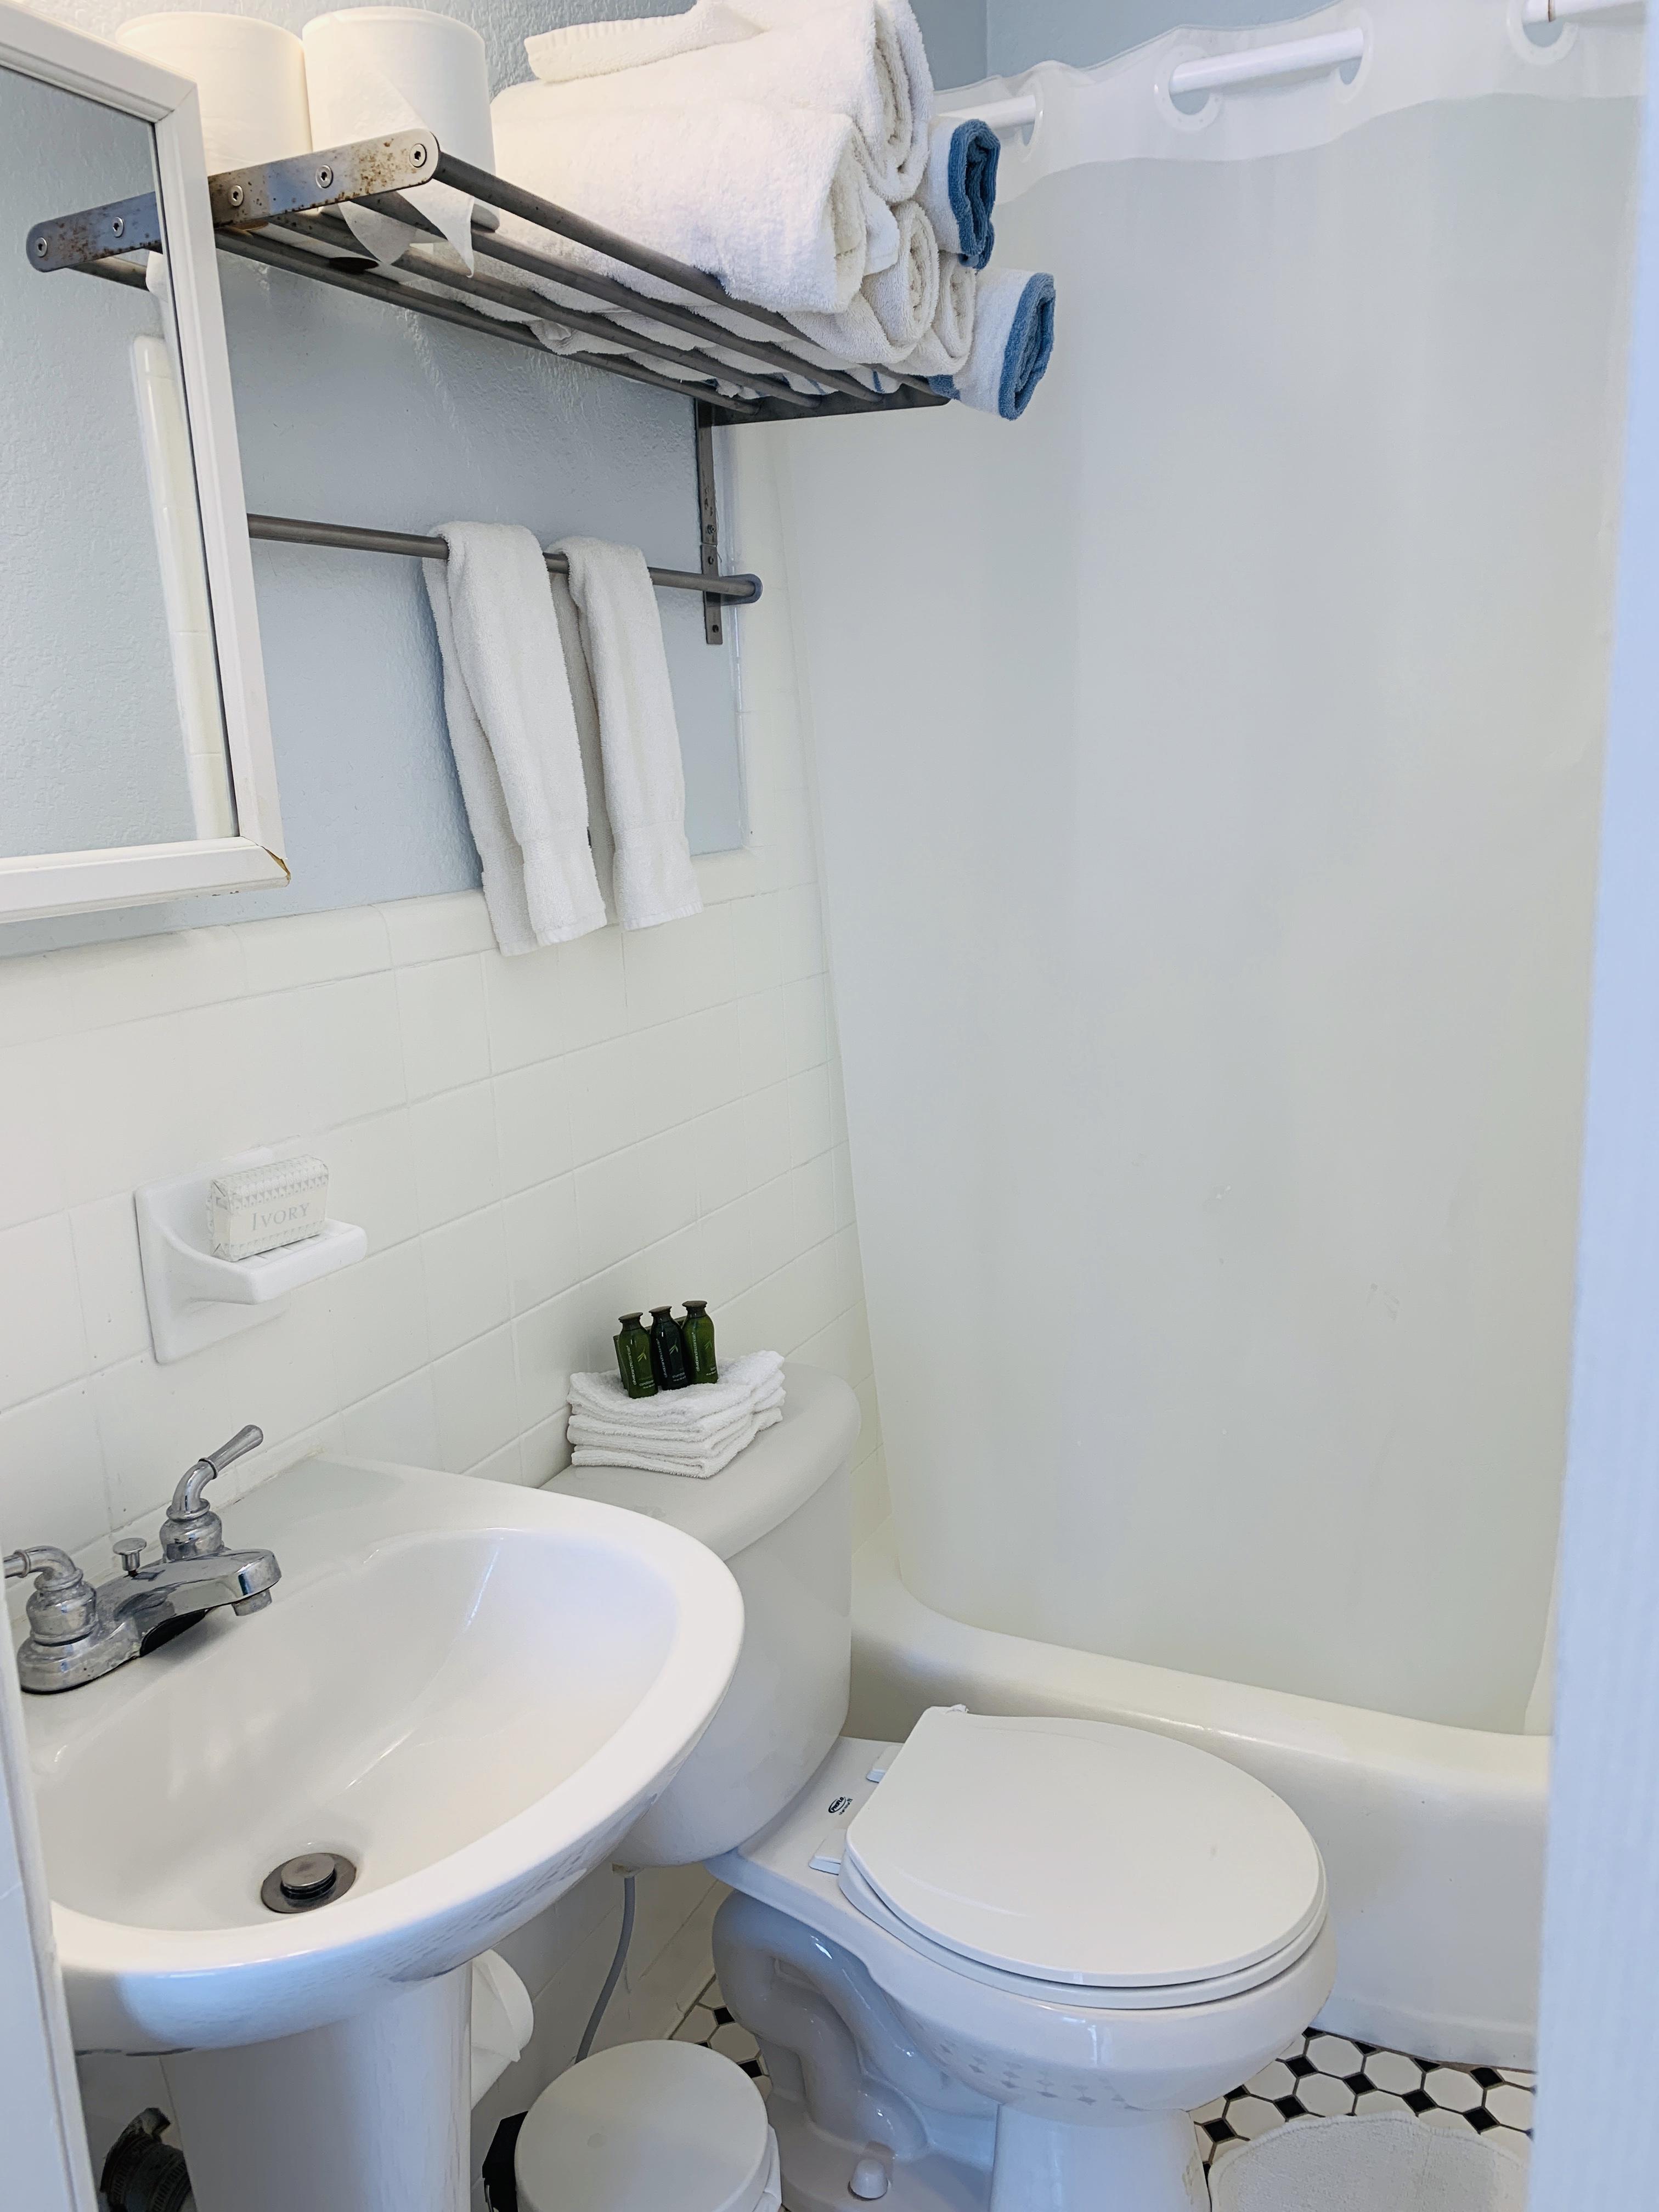 Unit 4 Studio Bathroom